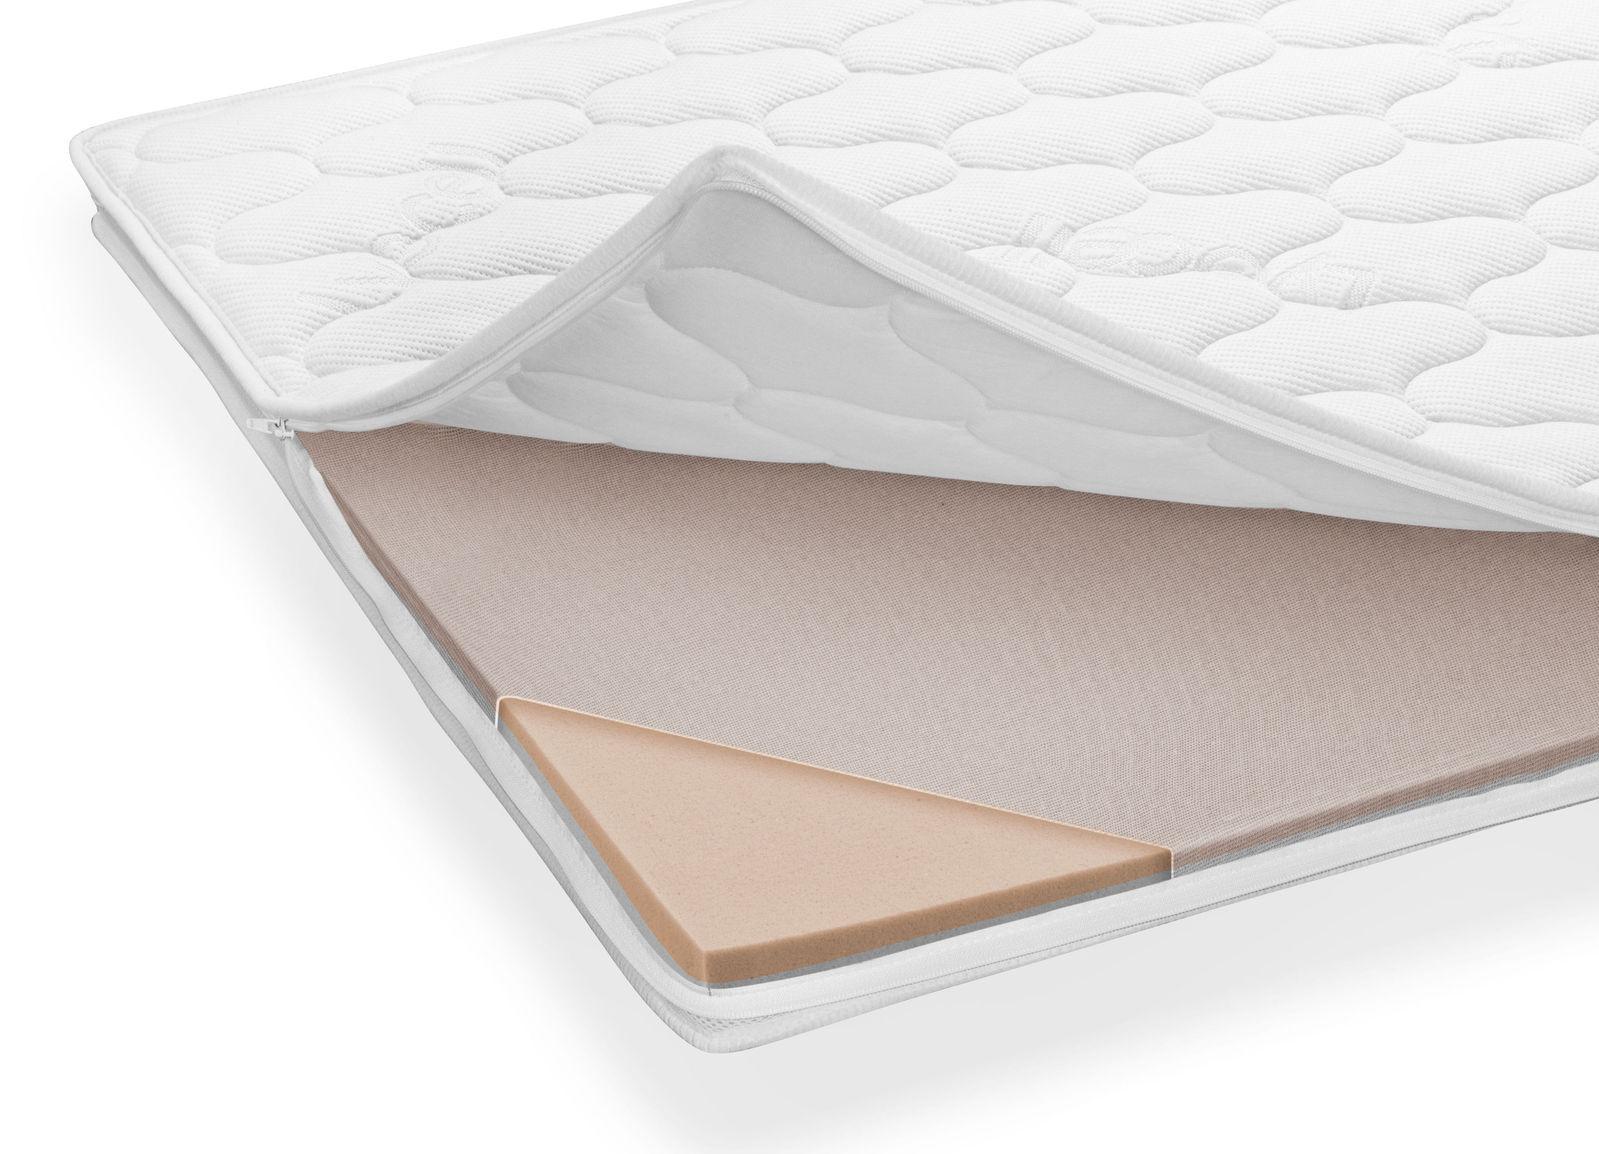 anpassungsf higer topper aus viscoschaum mit abnehmbarem bezug. Black Bedroom Furniture Sets. Home Design Ideas